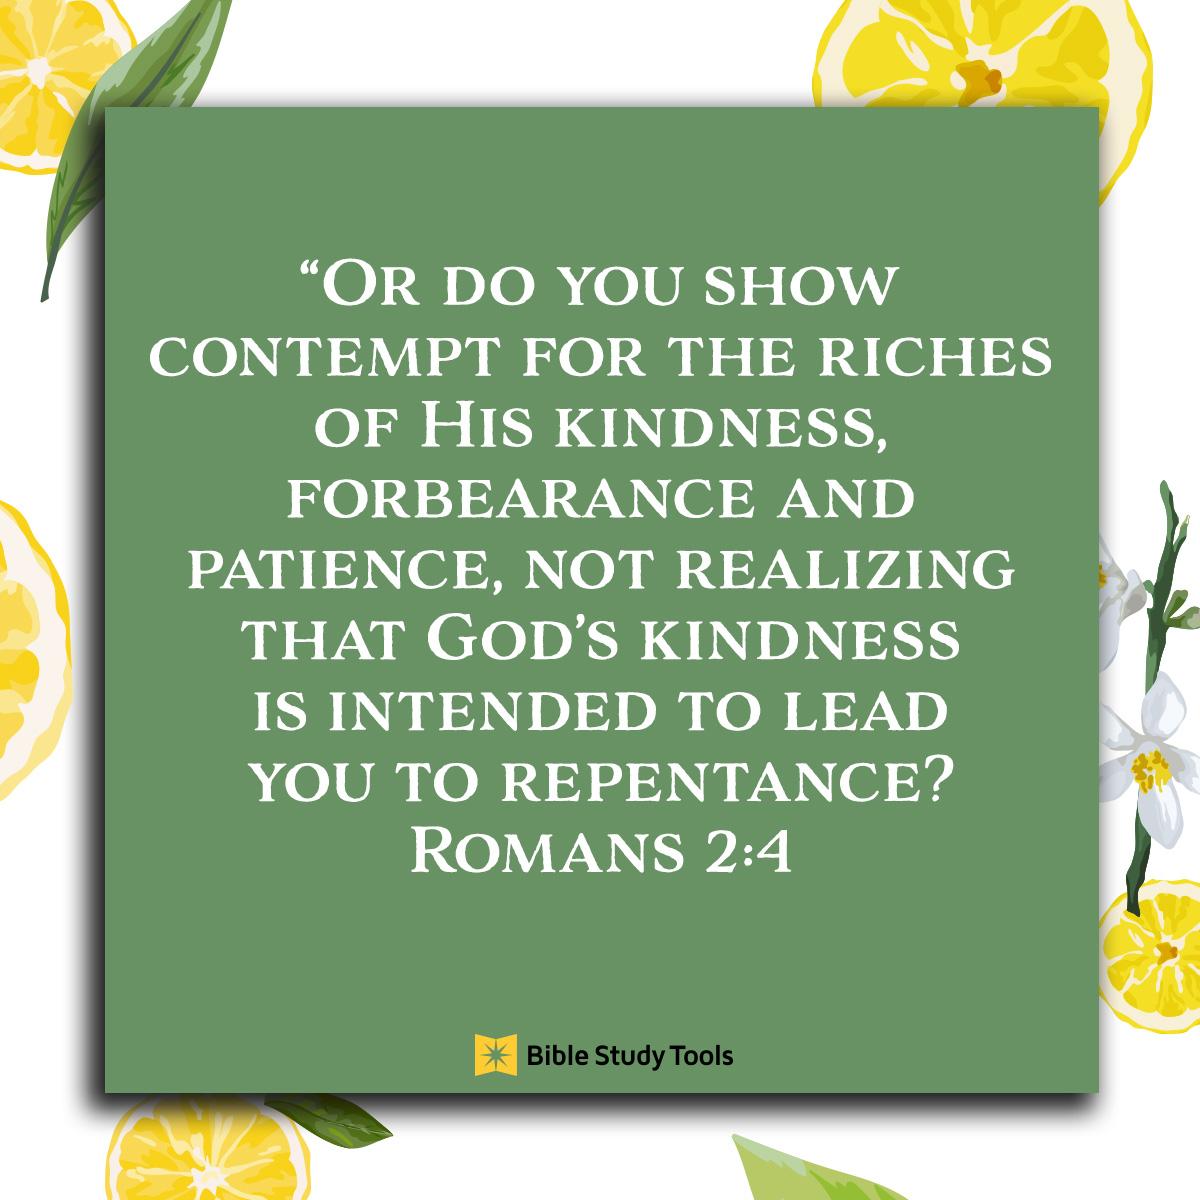 Romans 2:4, inspirational image